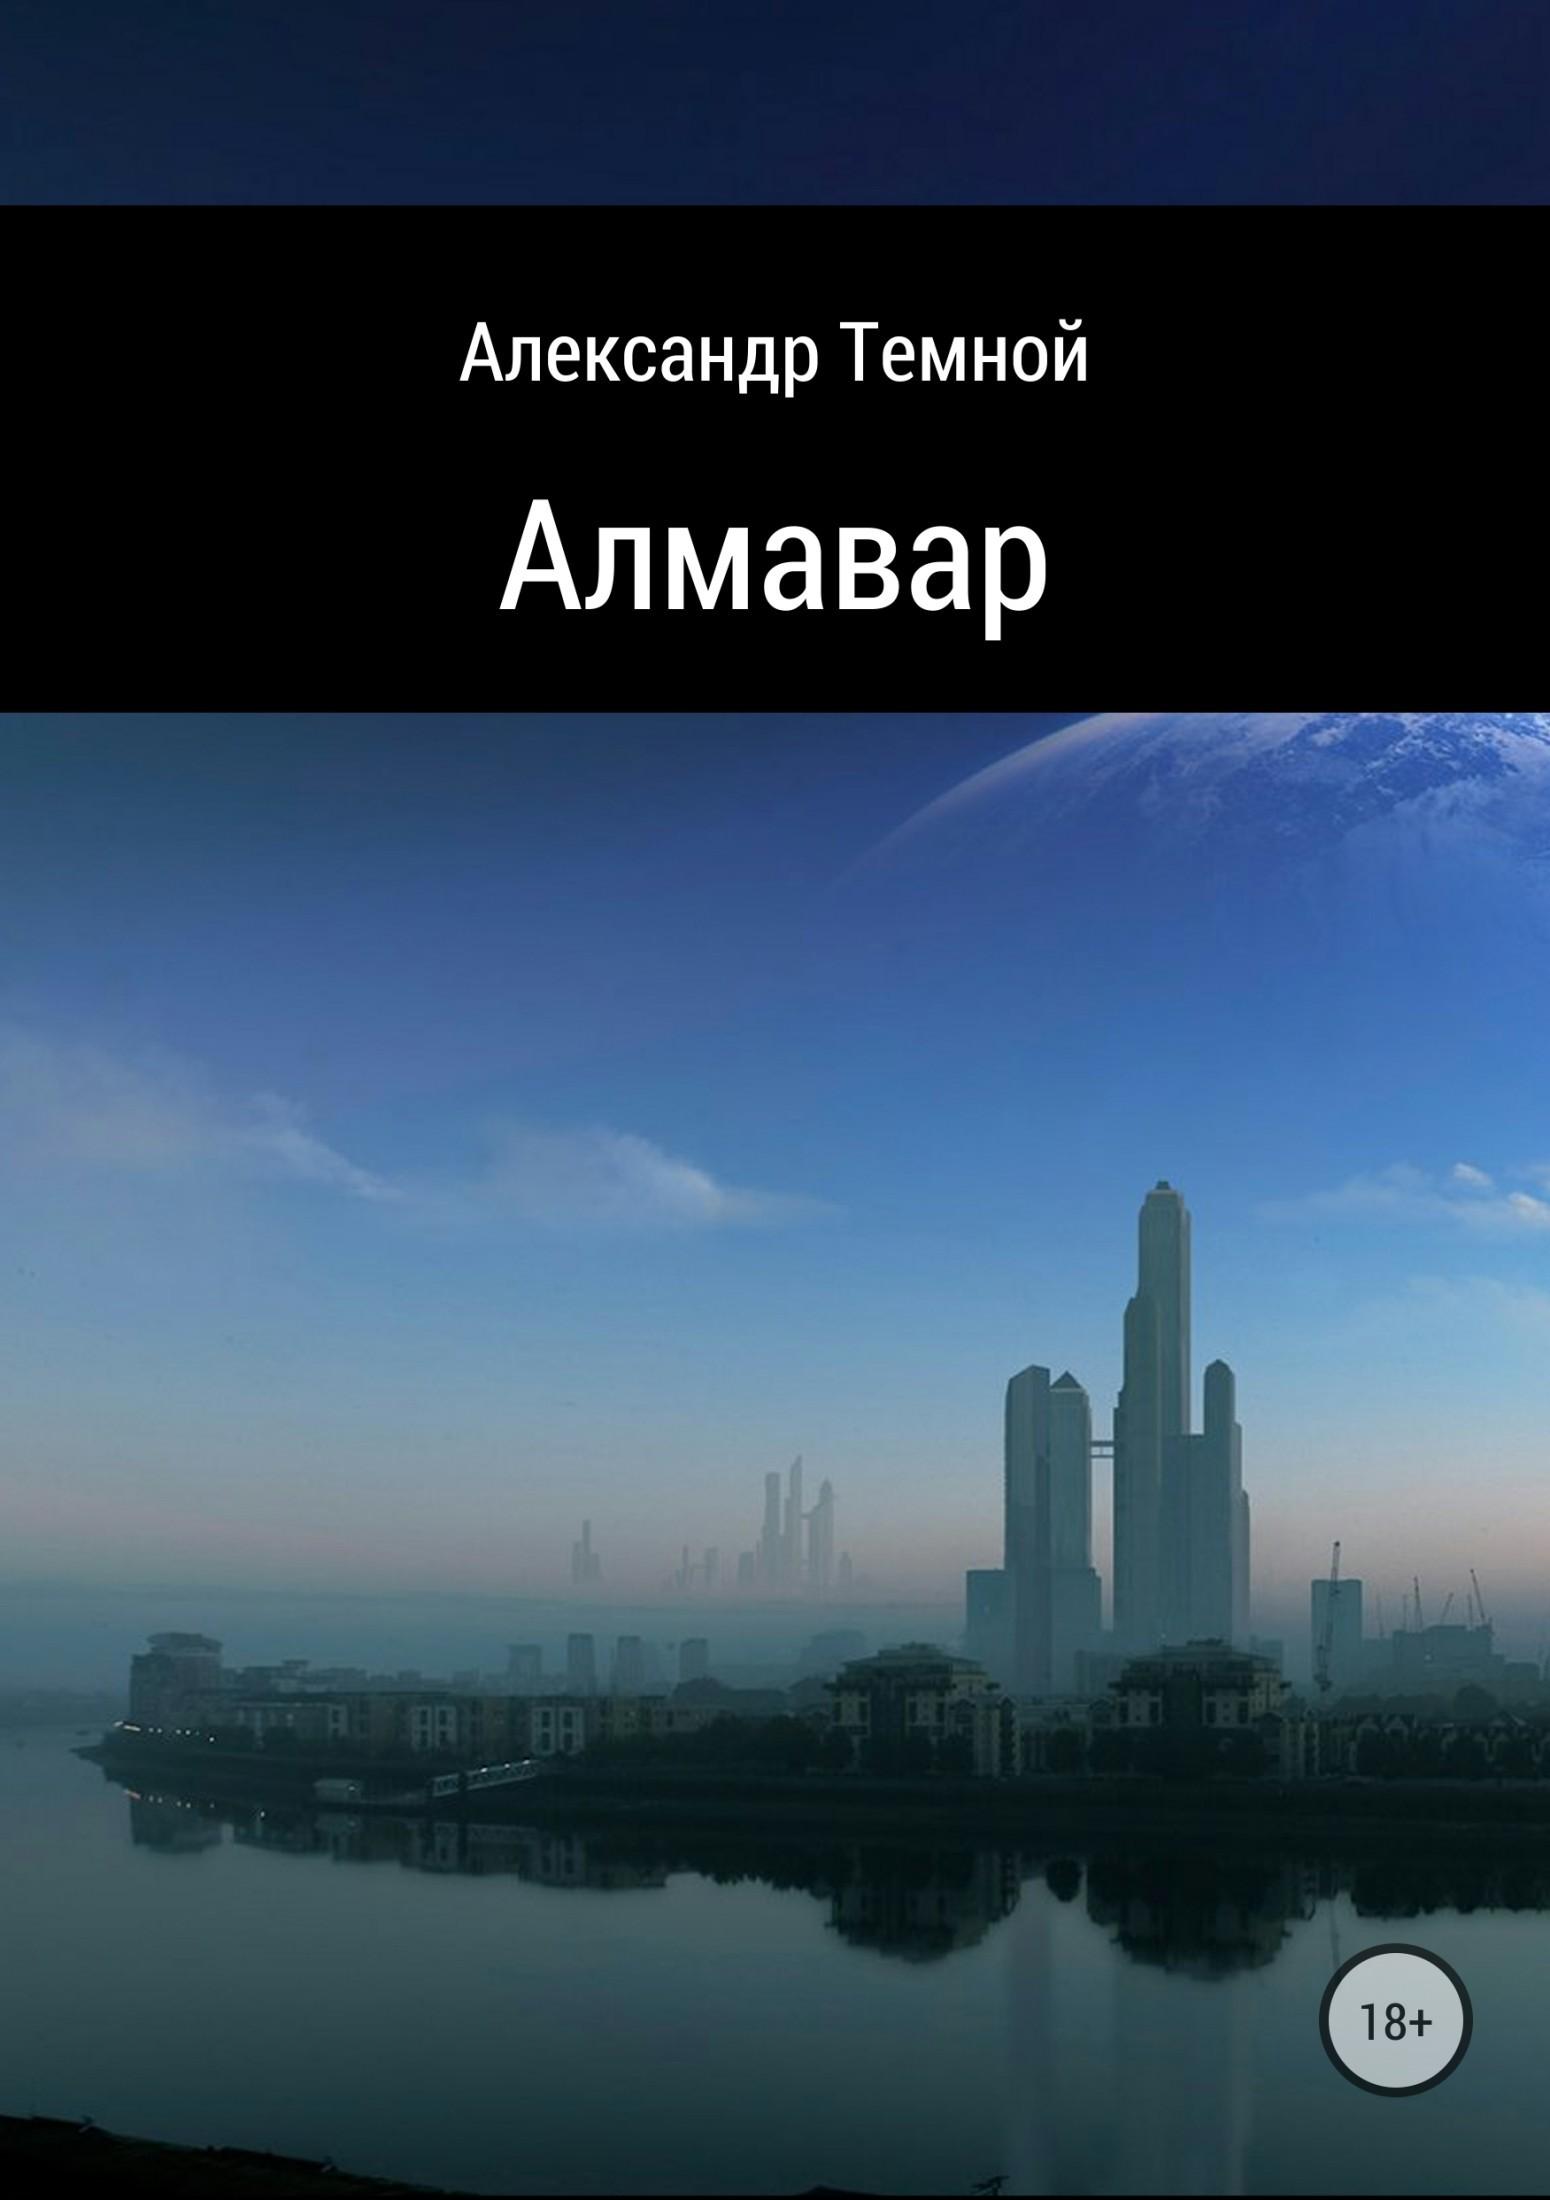 все цены на Александр Валерьевич Темной Алмавар онлайн